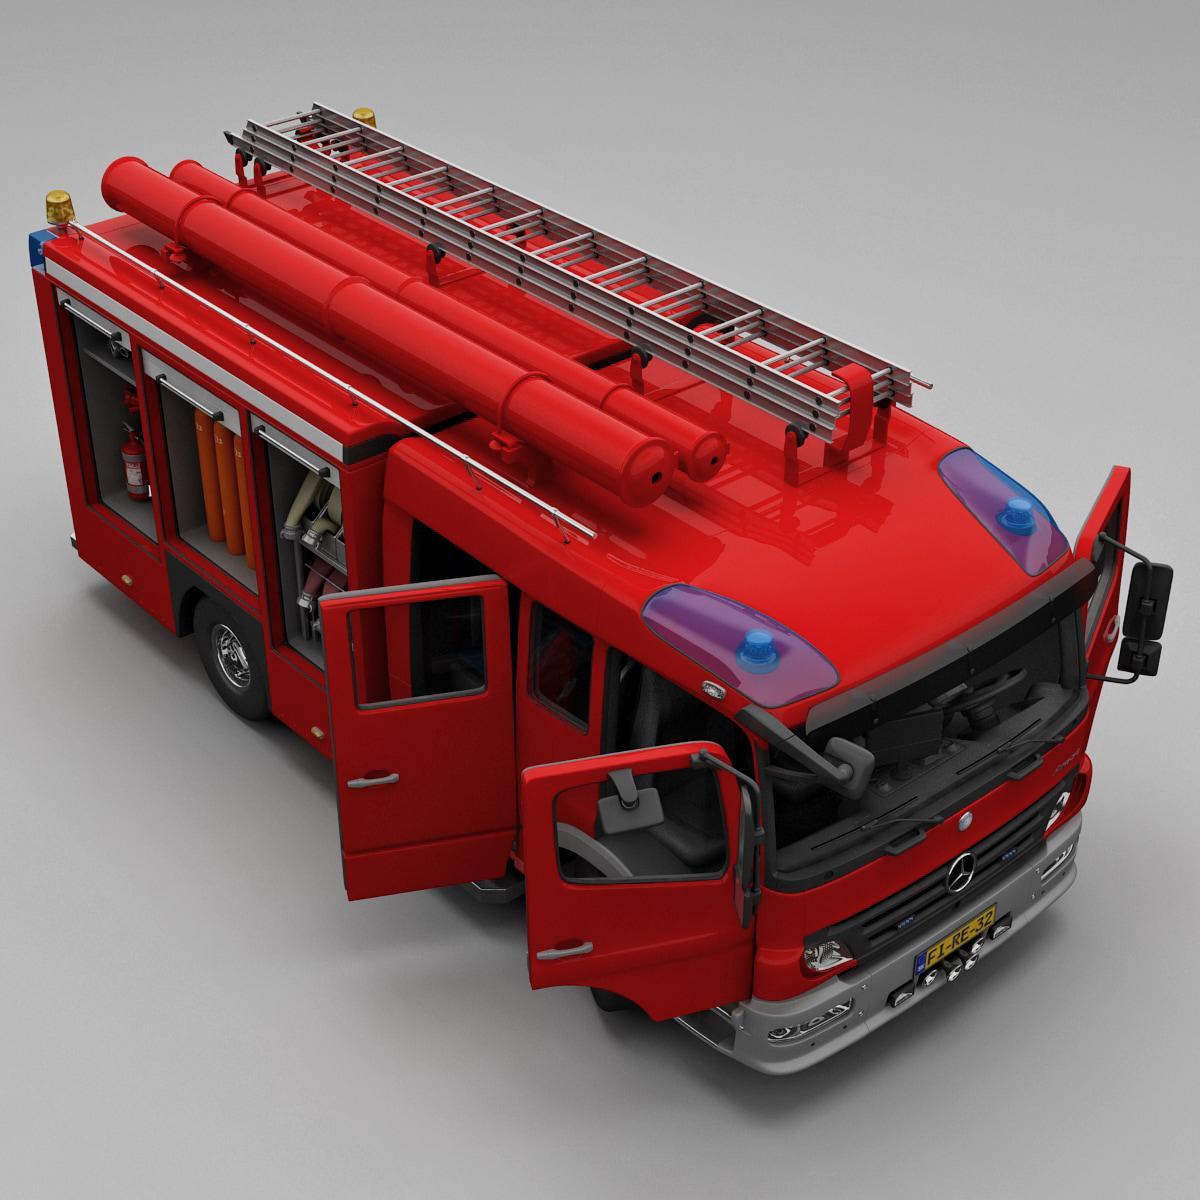 Mercedes_Atego_Fire_Truck_Rigged_0001.jpg